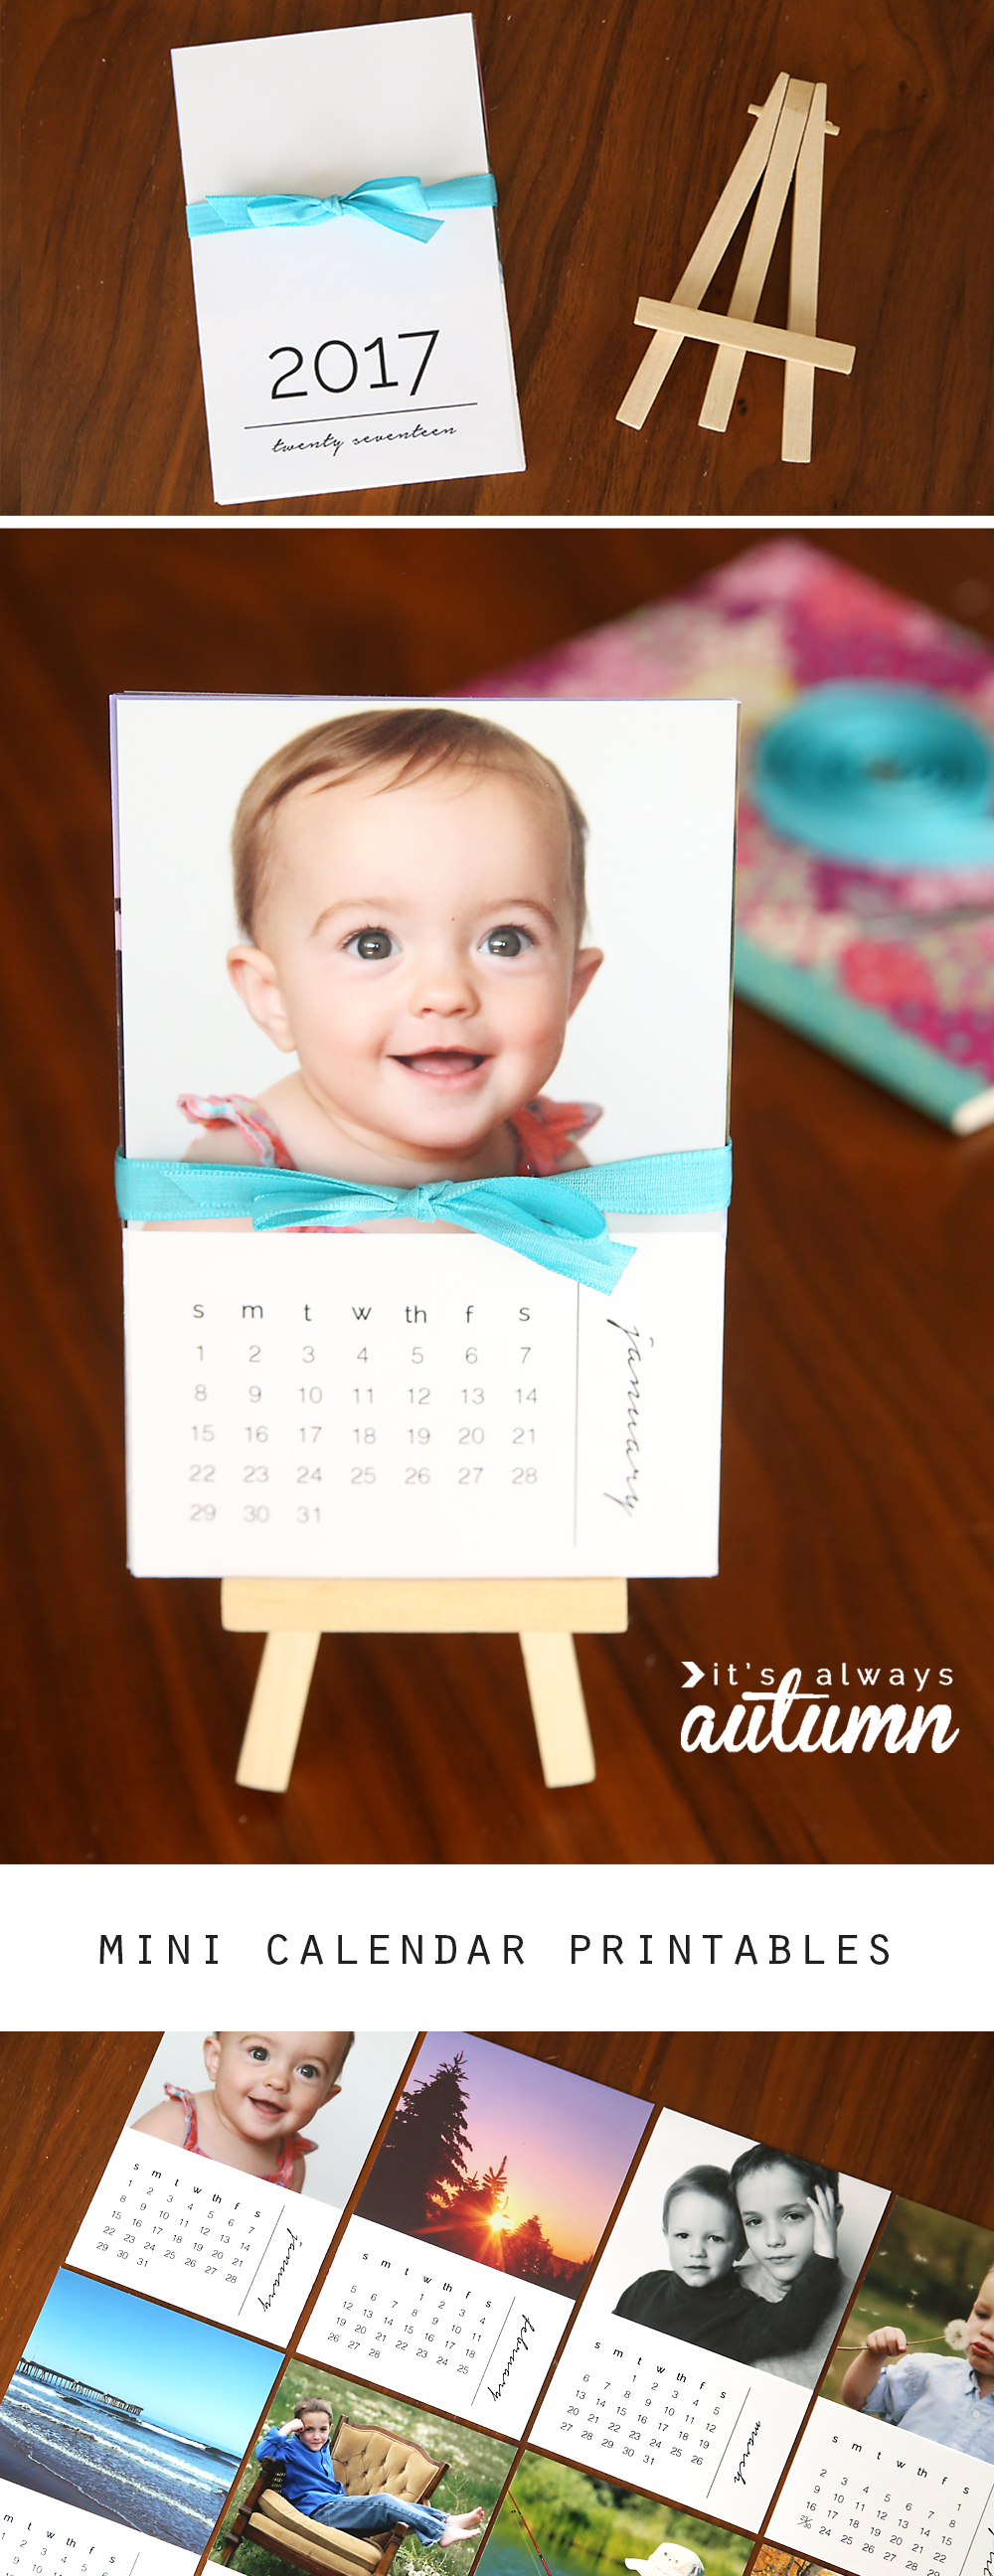 Calendar Diy : Diy mini photo calendar w free printables it s always autumn